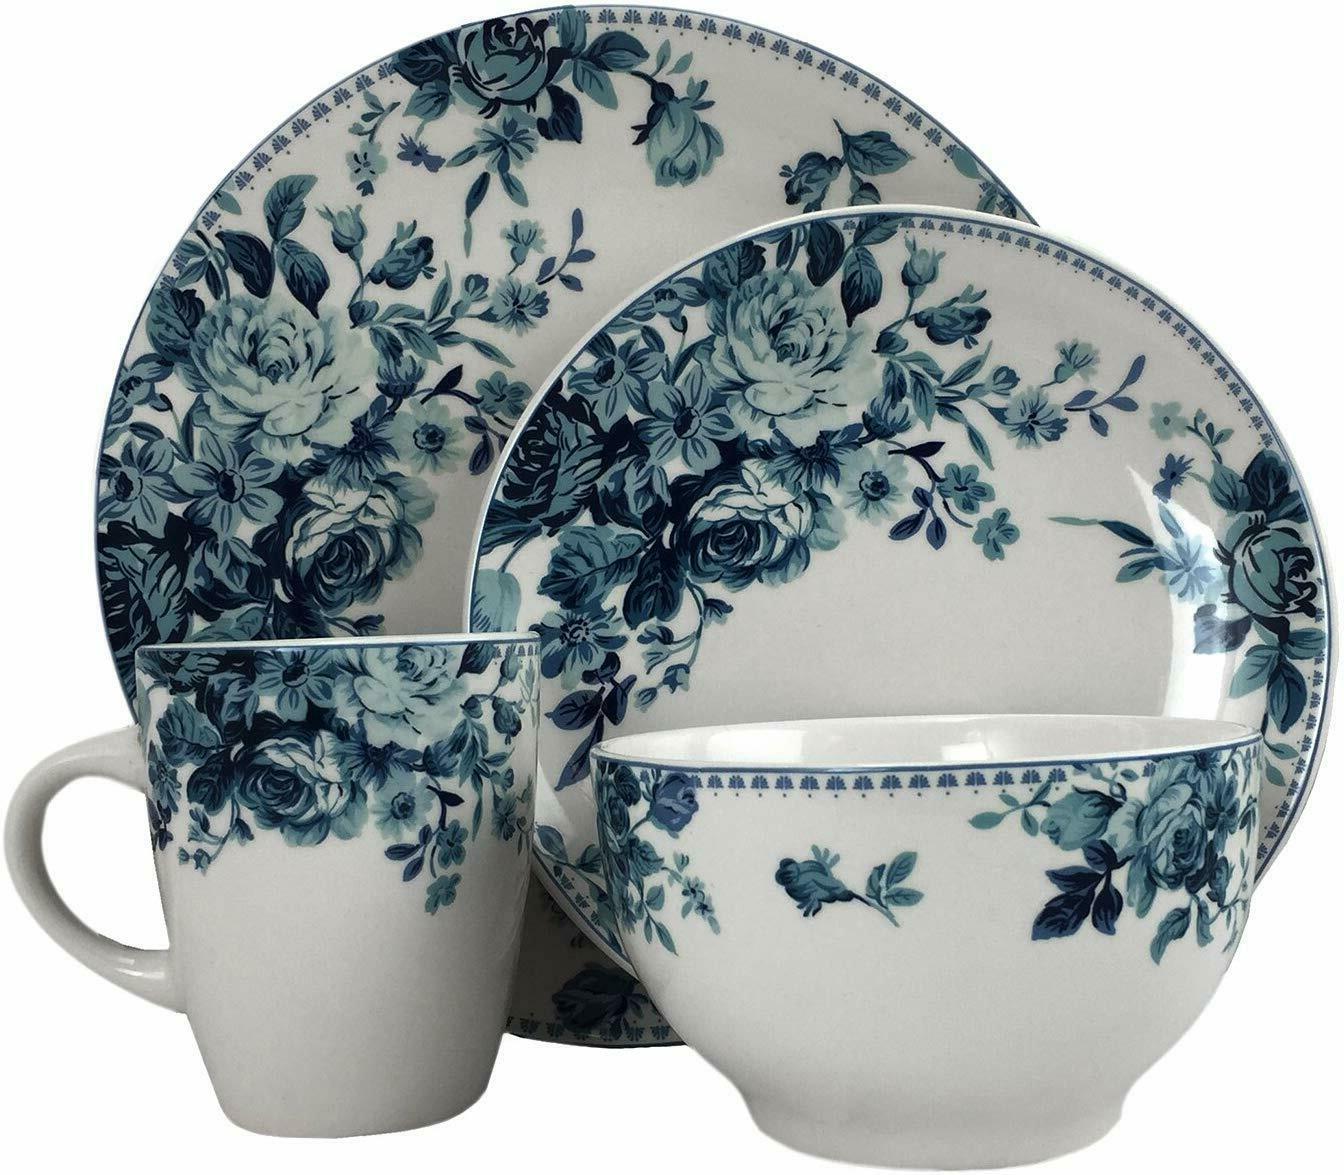 Round Stoneware Colored Pattern Dinnerware Dish Set 16 Piece